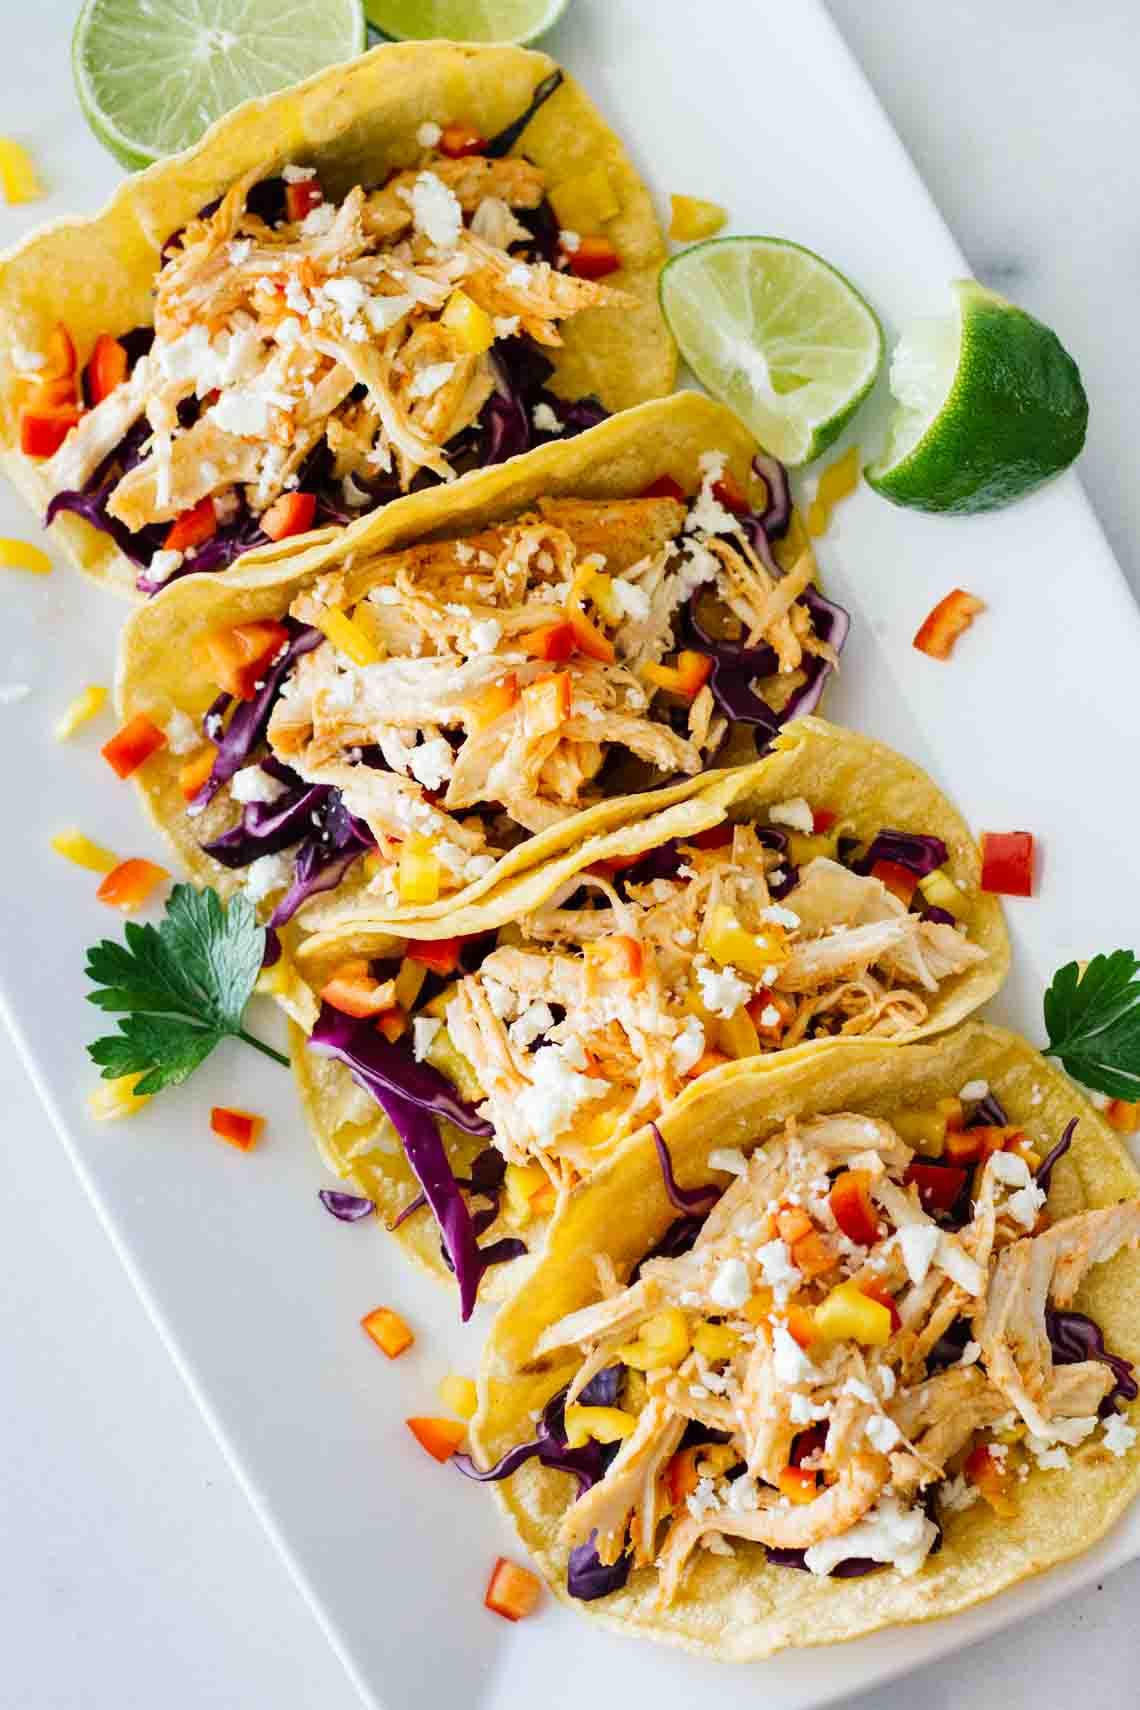 Easy Healthy Dinner Recipes  Healthy Sriracha Shredded Chicken Tacos Jar Lemons